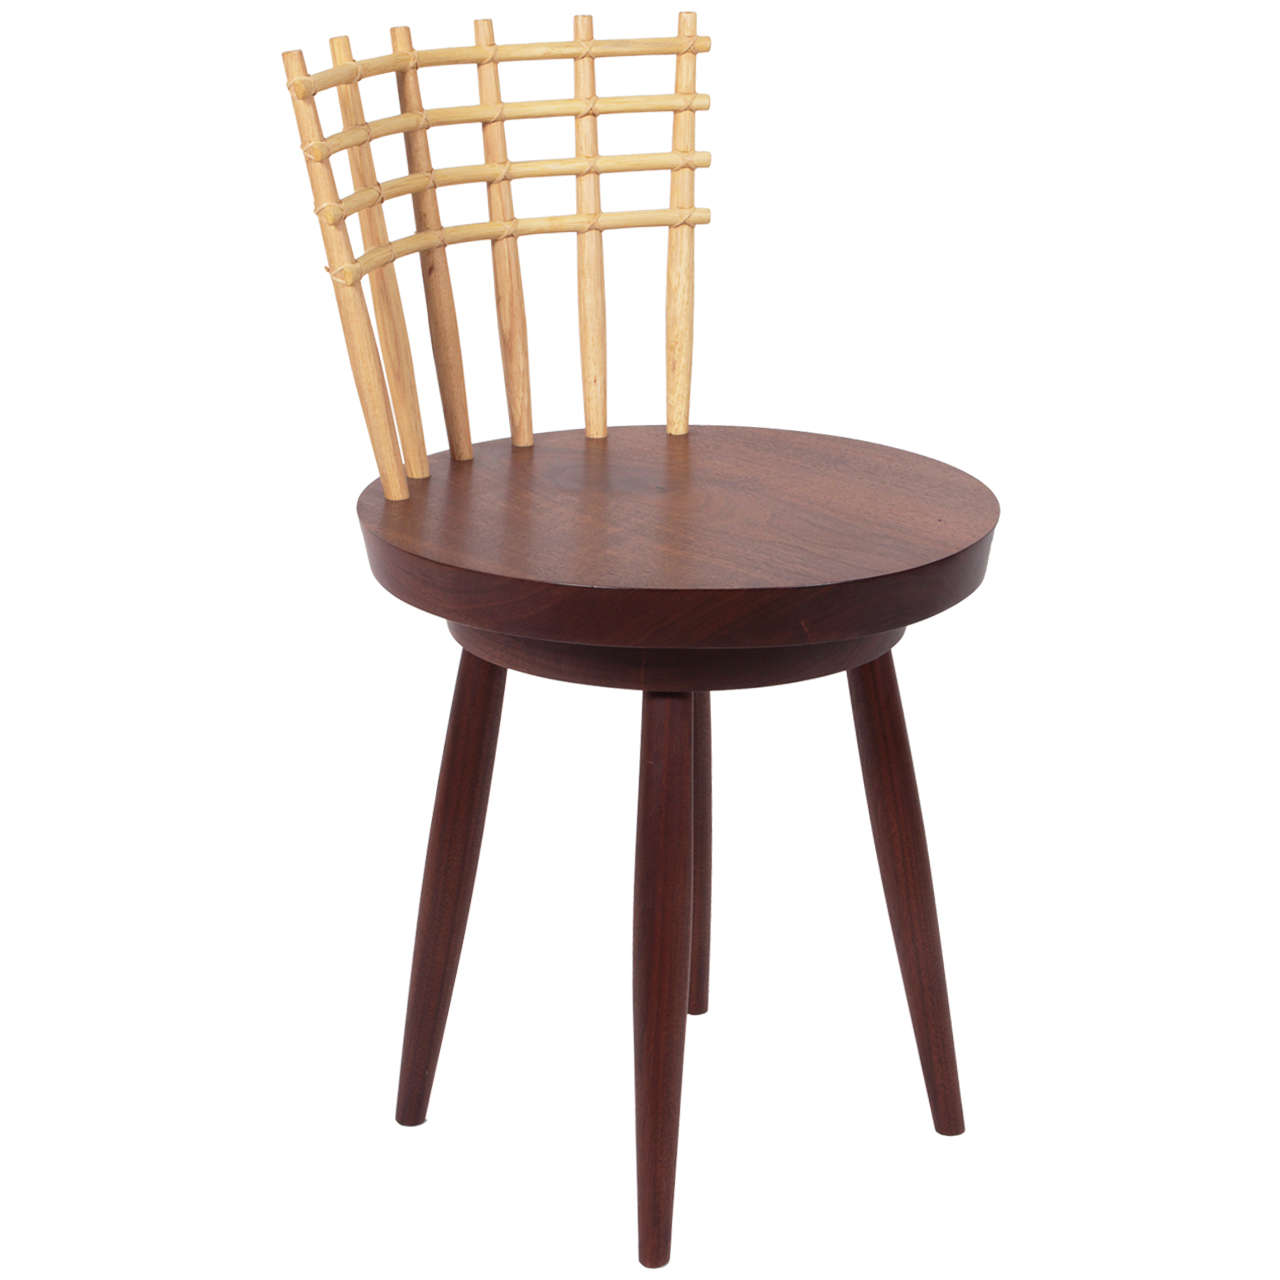 revolving chair laz boy george nakashima woodworker 2009 ligne